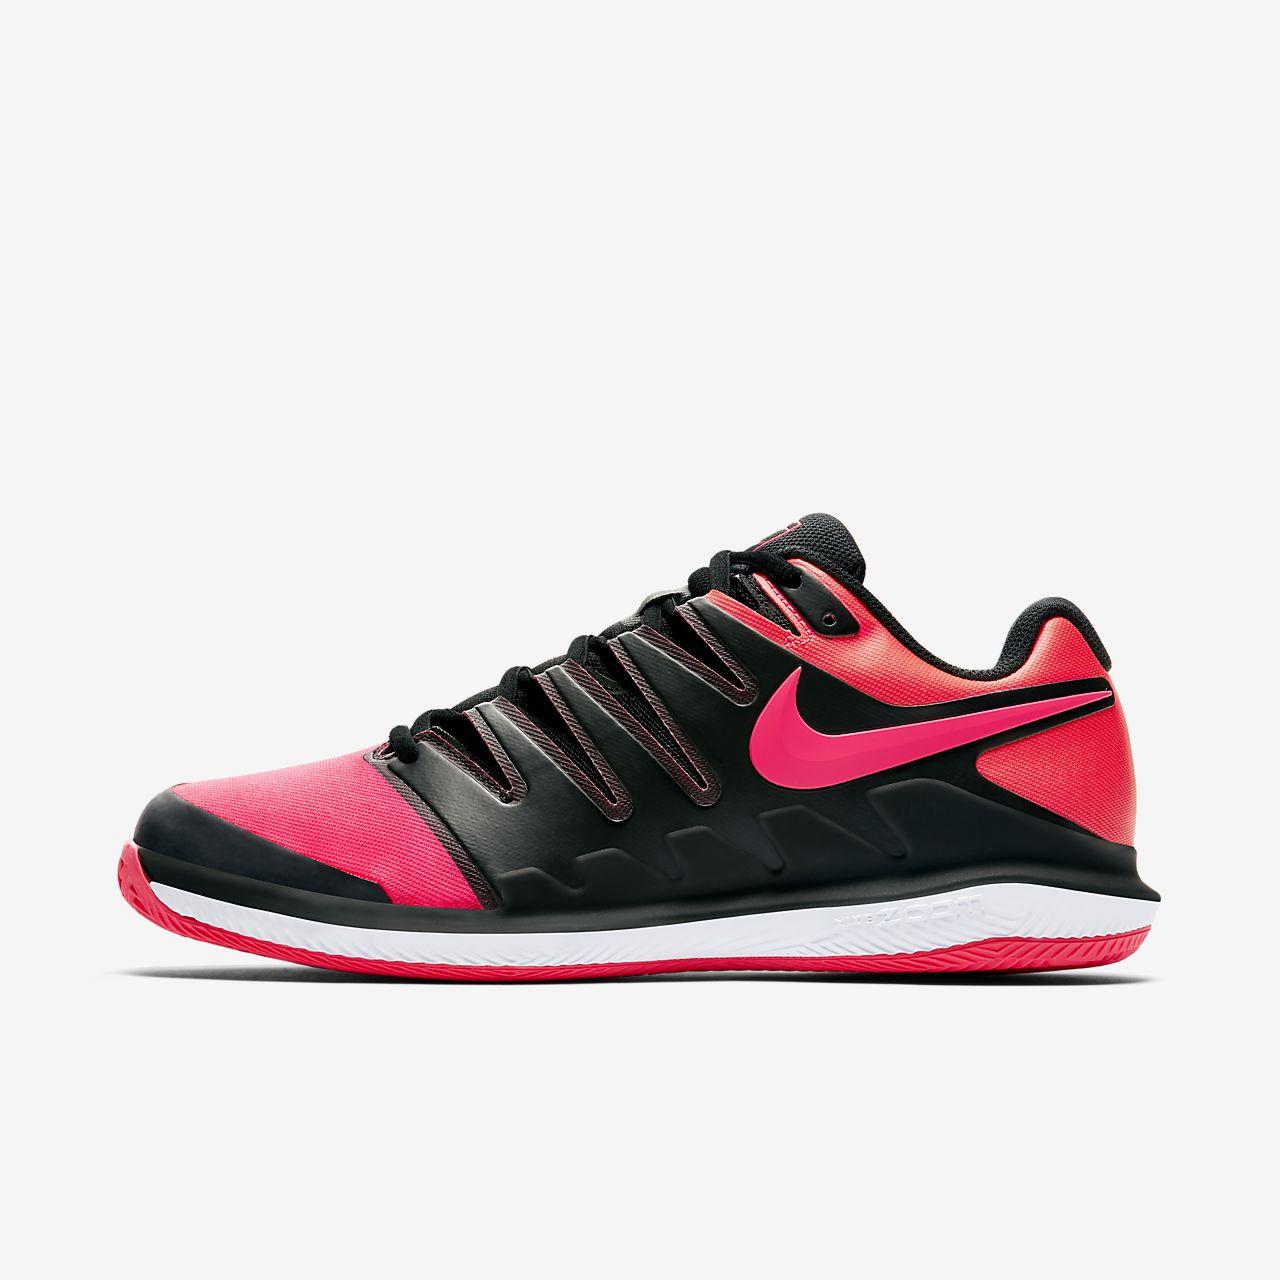 chaussures tennis nike zoom vapor